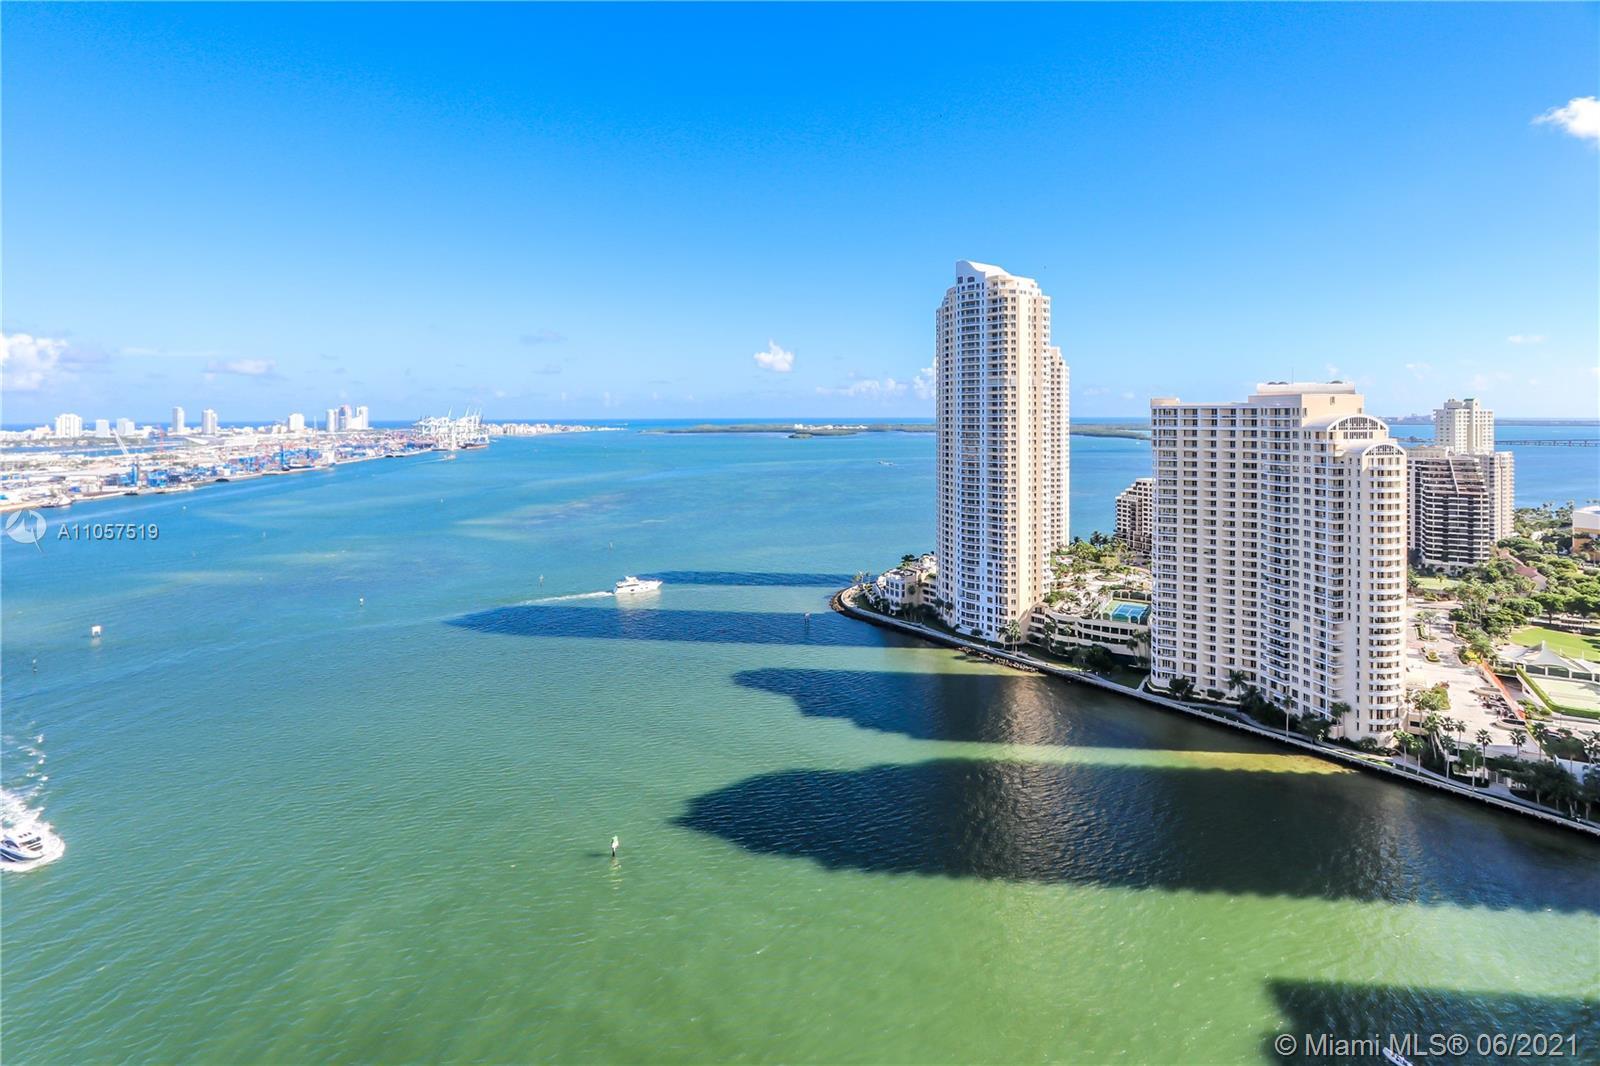 One Miami West #3326 - 325 S Biscayne Blvd #3326, Miami, FL 33131